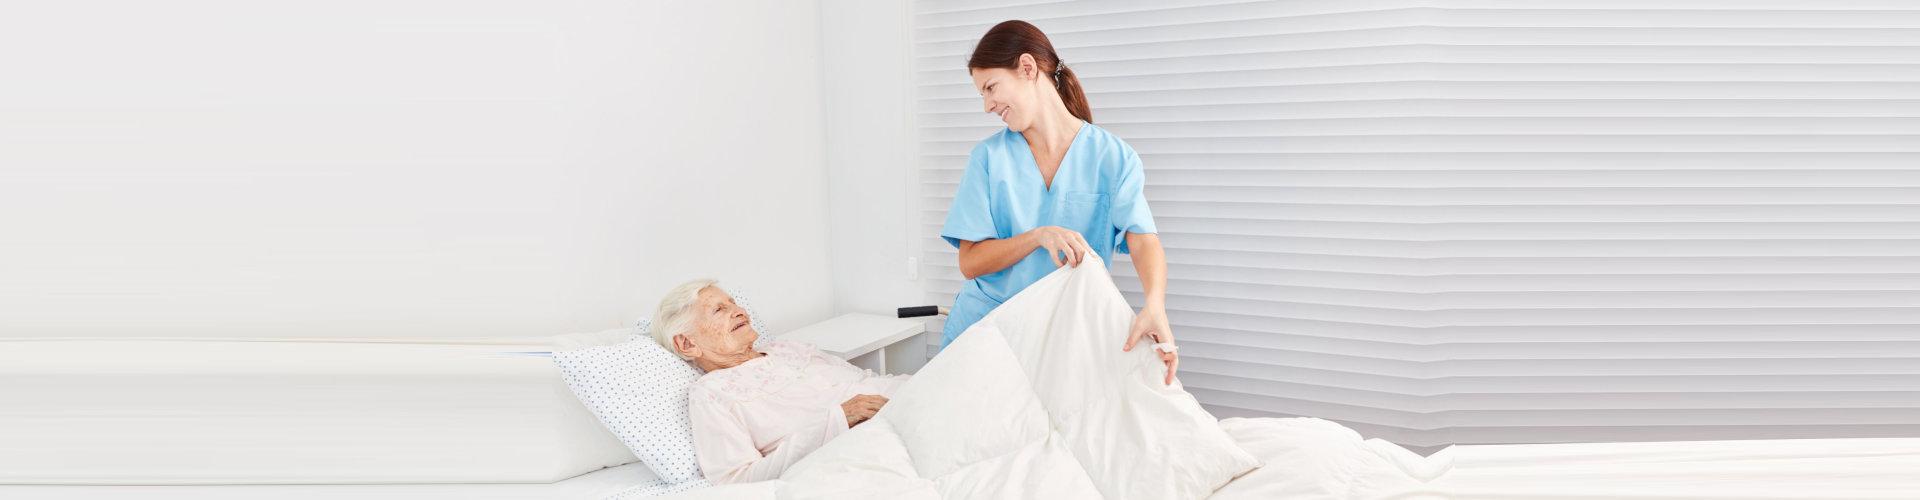 nurse taking care of a sick senior citizen in bed